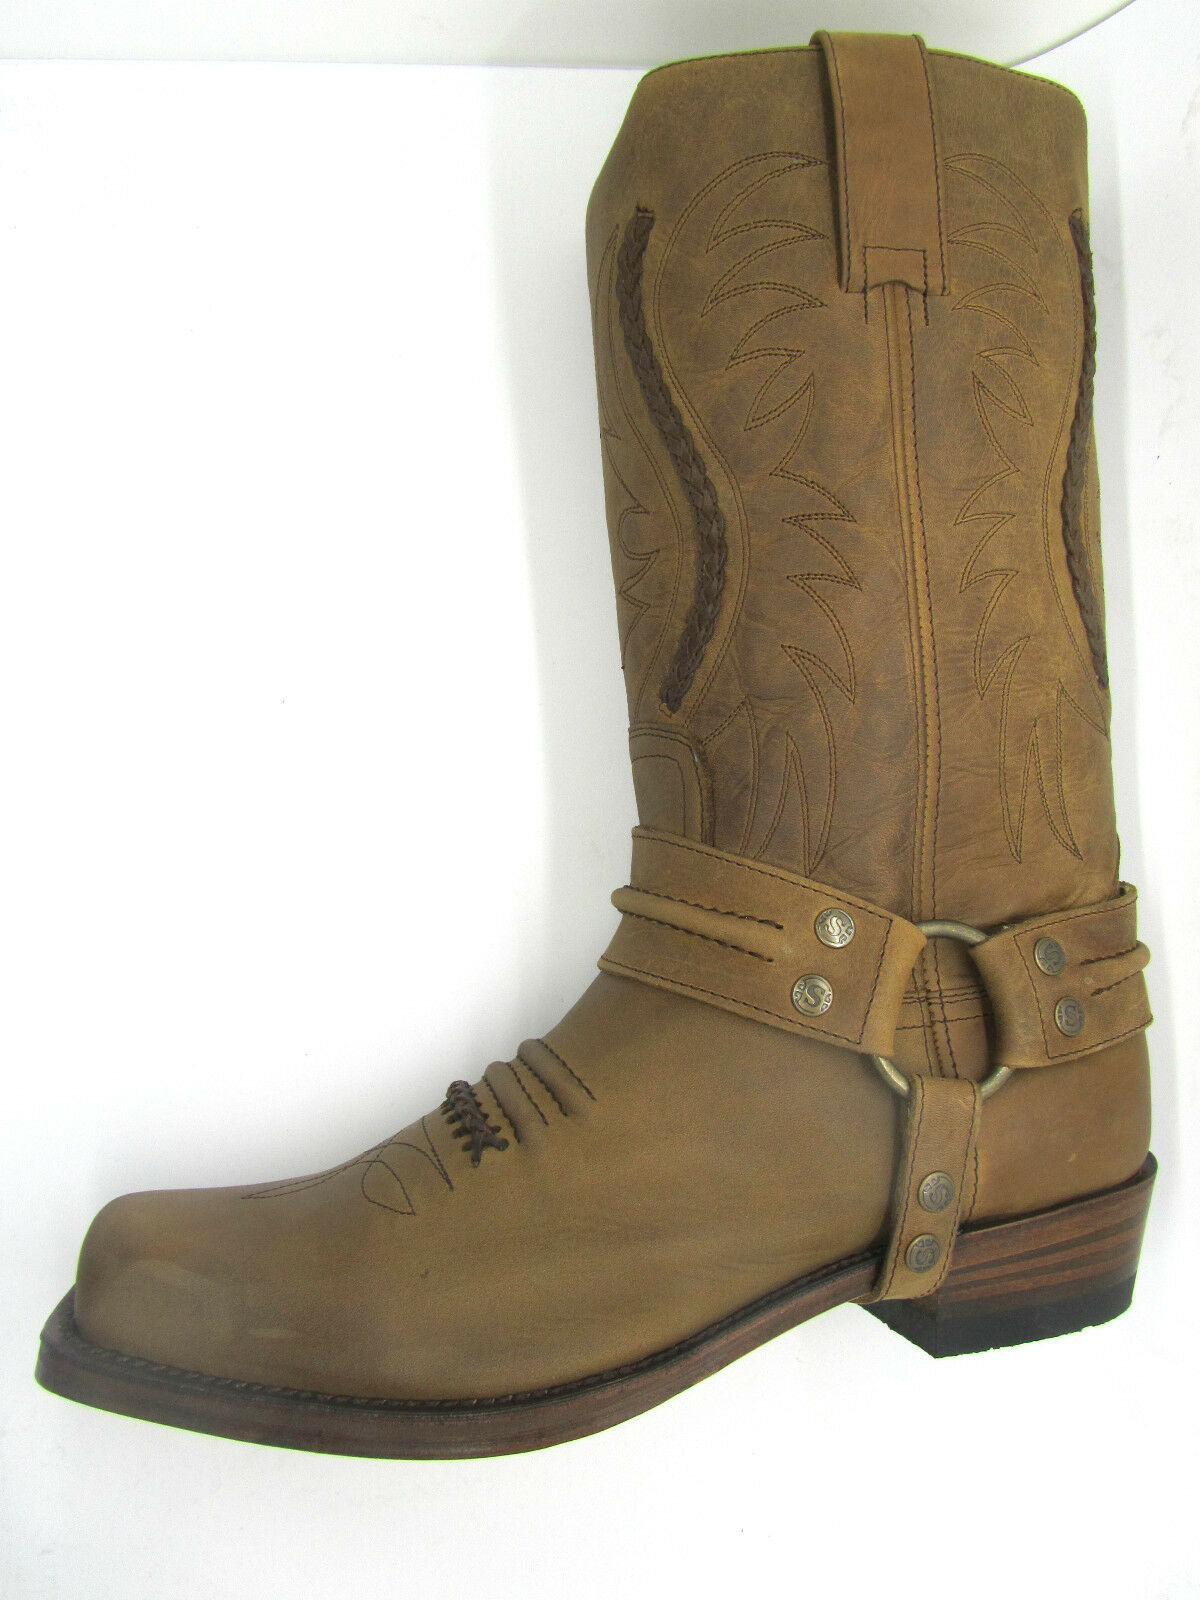 Sendra 12209 Men Cowboy Boots Bike Brown Leather Western Biker Boot